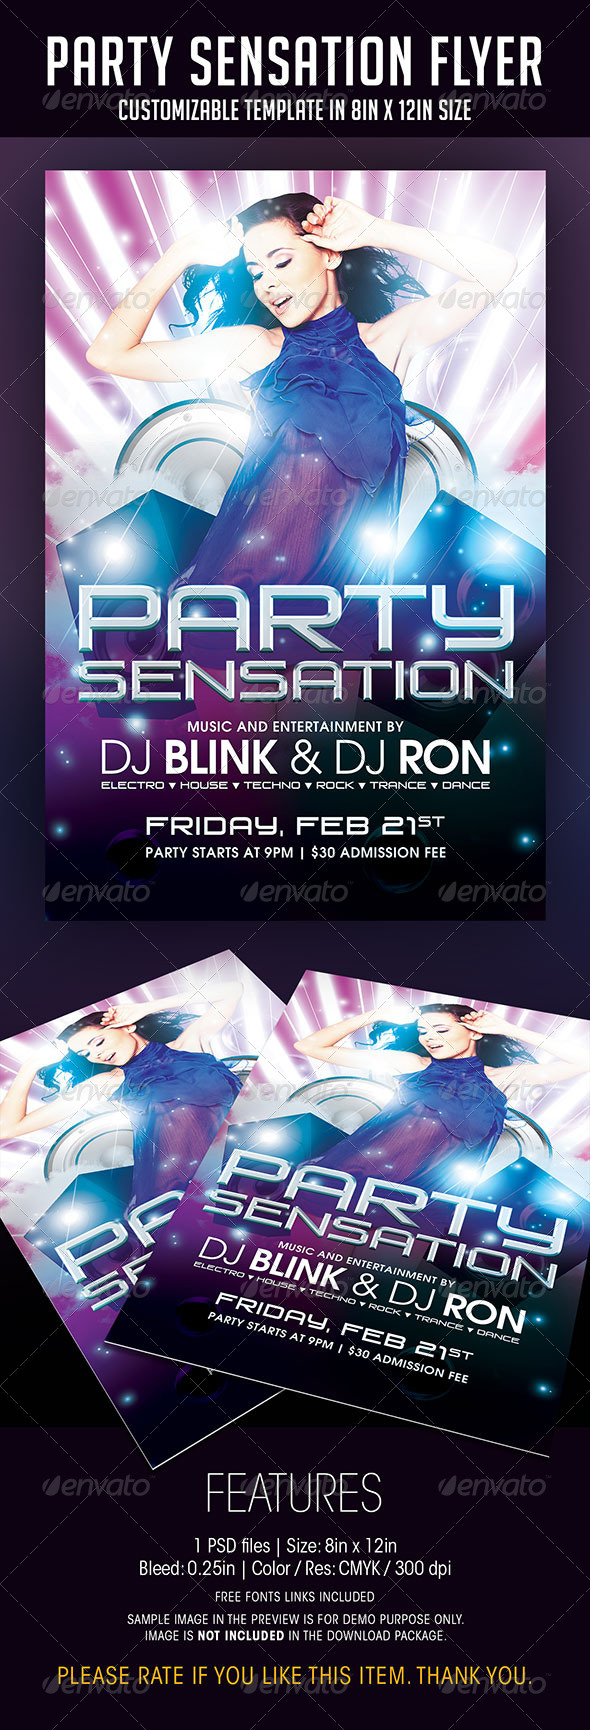 Party Sensation Flyer - Clubs & Parties Events